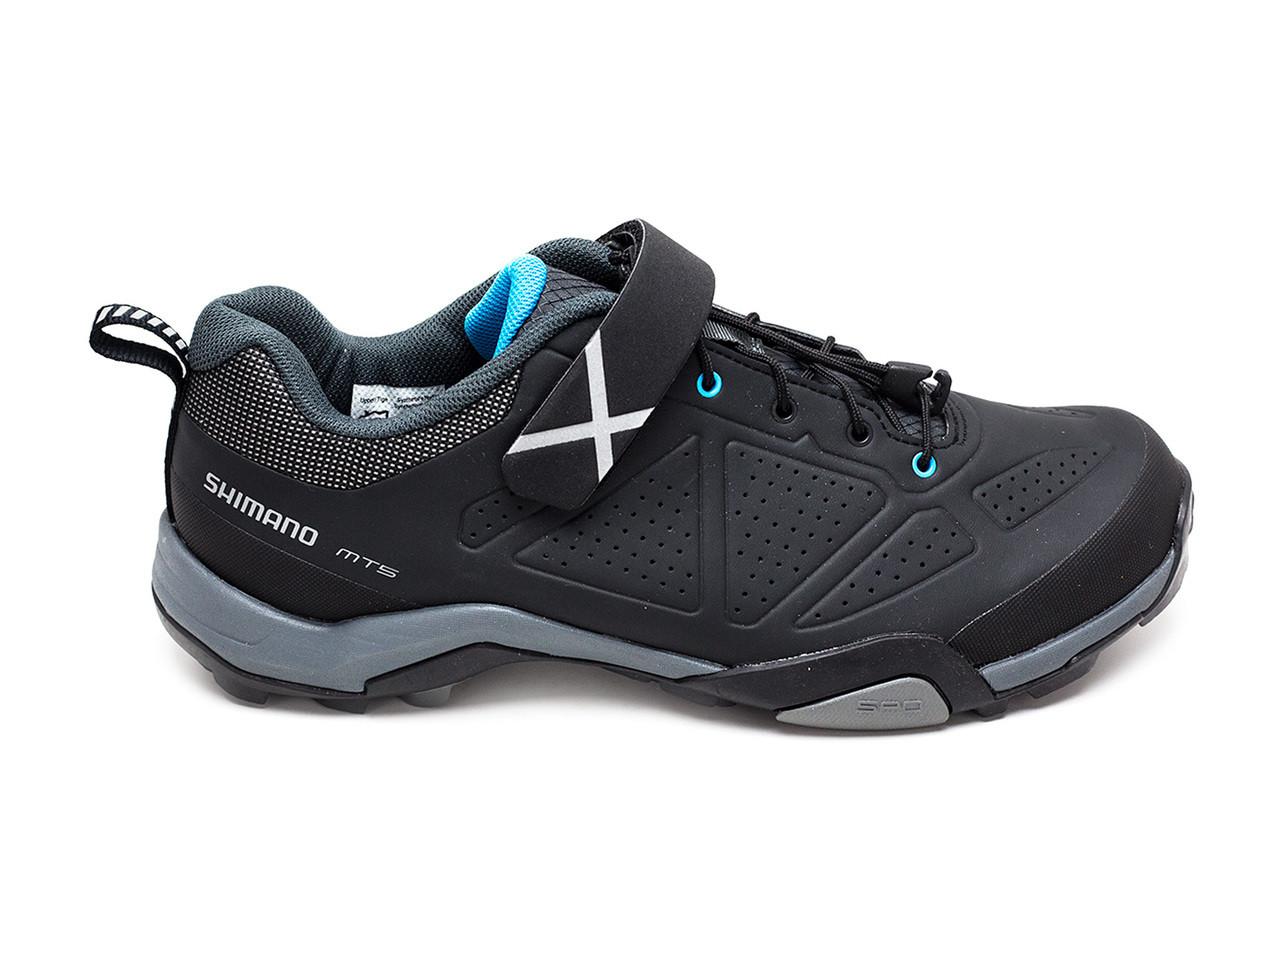 código promocional 8d469 7b7ce Shimano SH-MT5 Men's Mountain/Touring Cycling Shoes